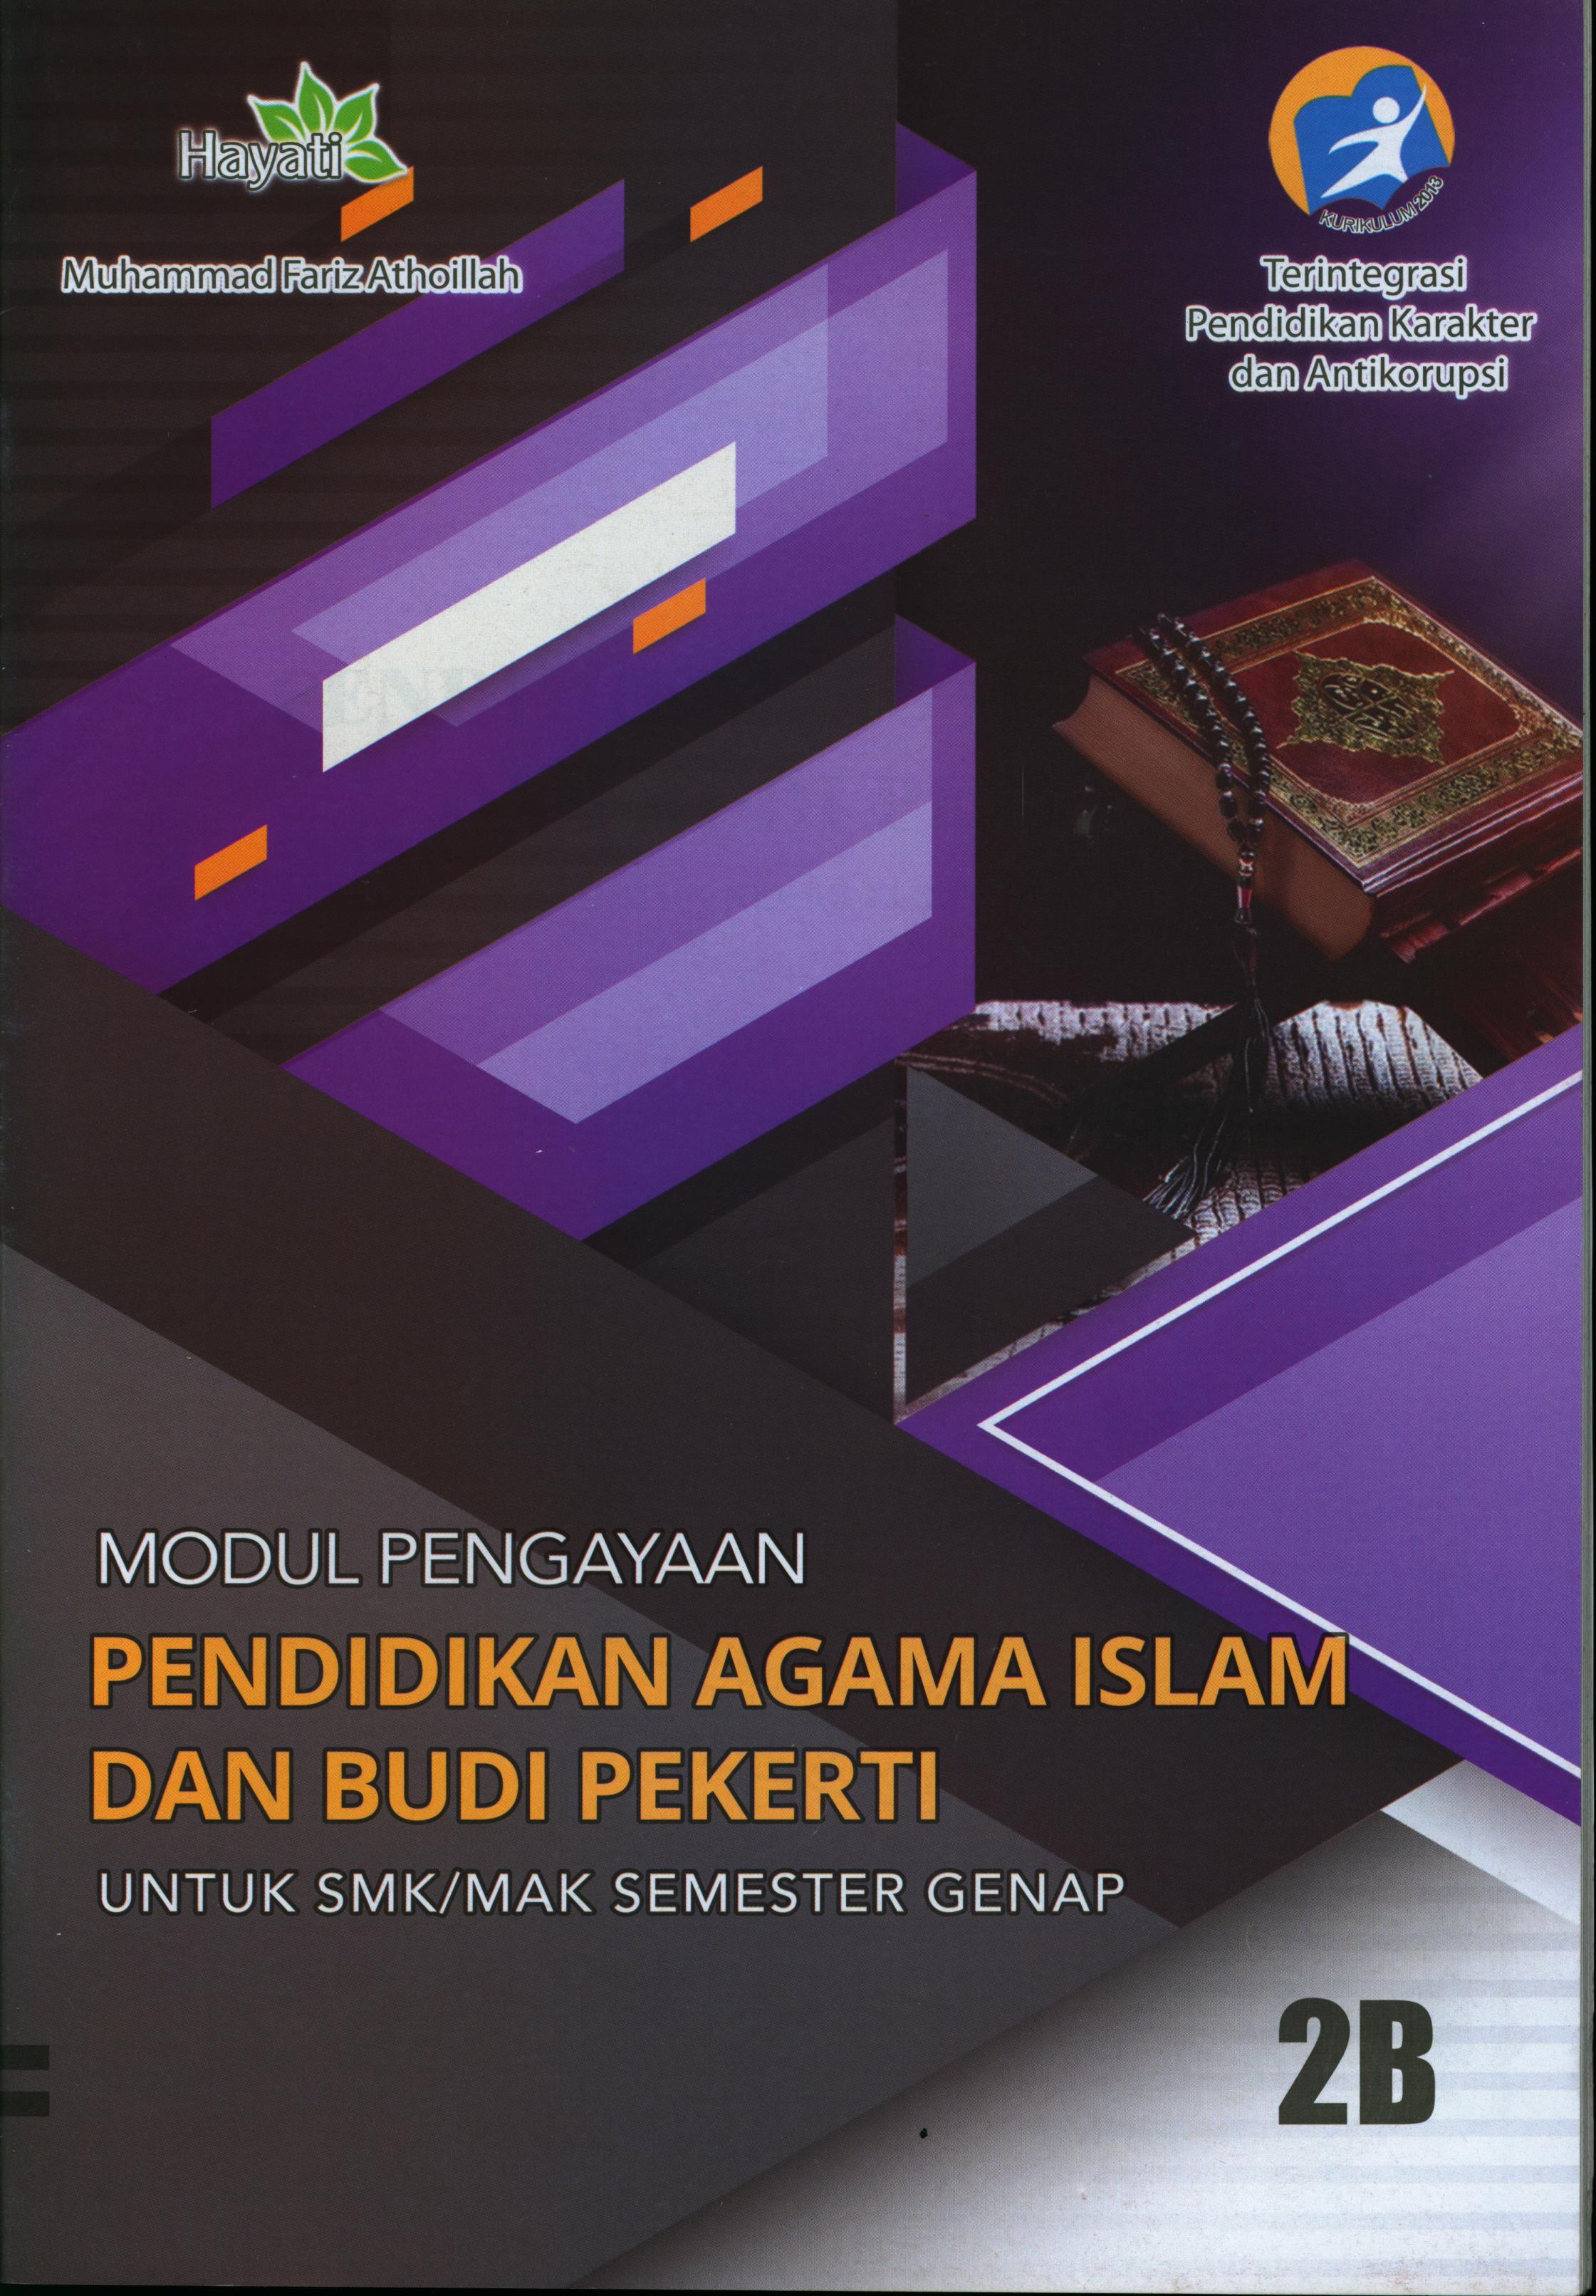 Jawaban Lks Bahasa Jawa Kelas 7 Kurikulum 2013 - Guru Ilmu ...